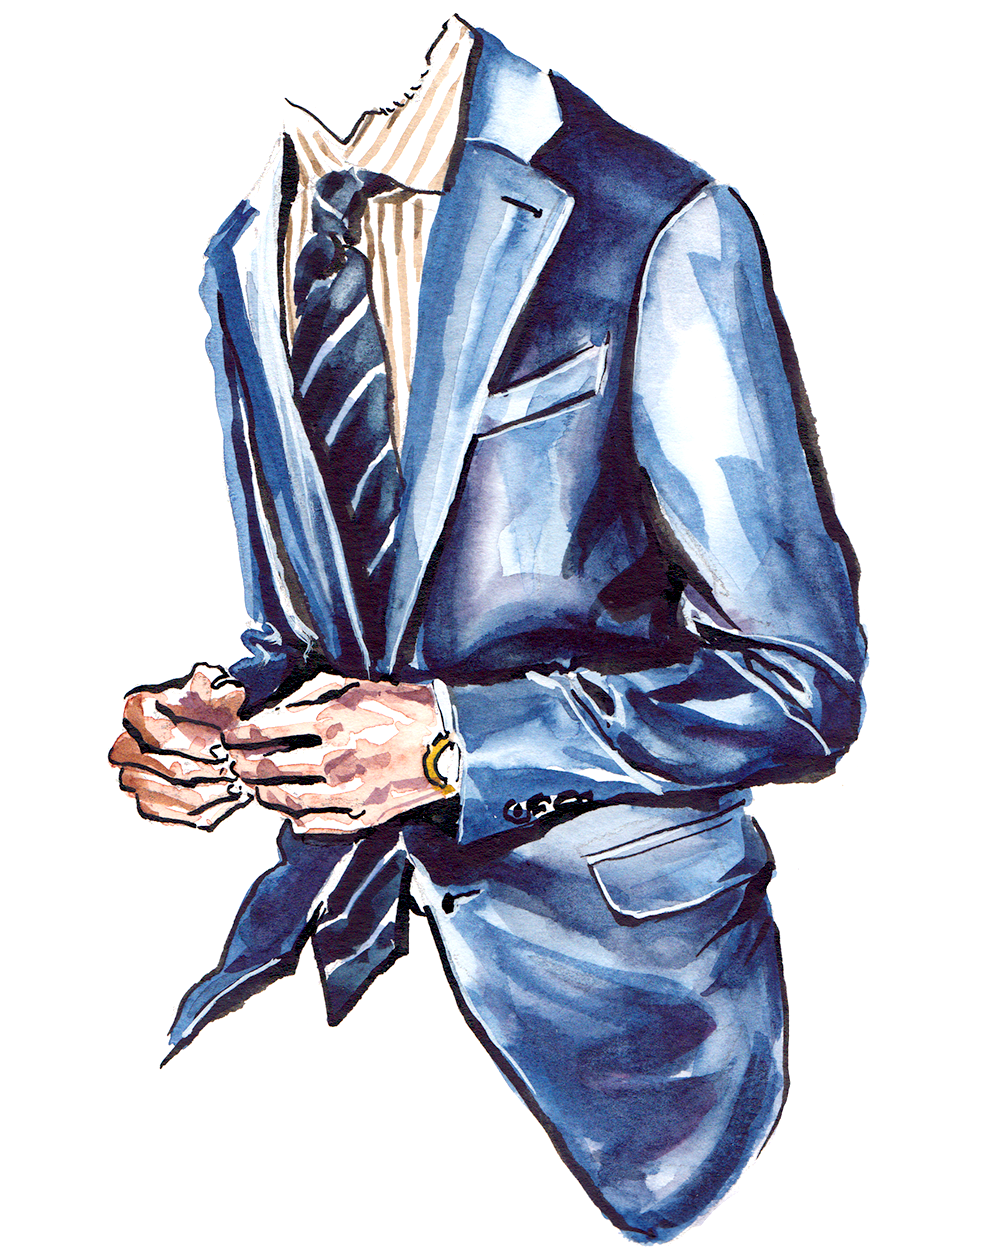 Zegna Suit Menswear Illustration